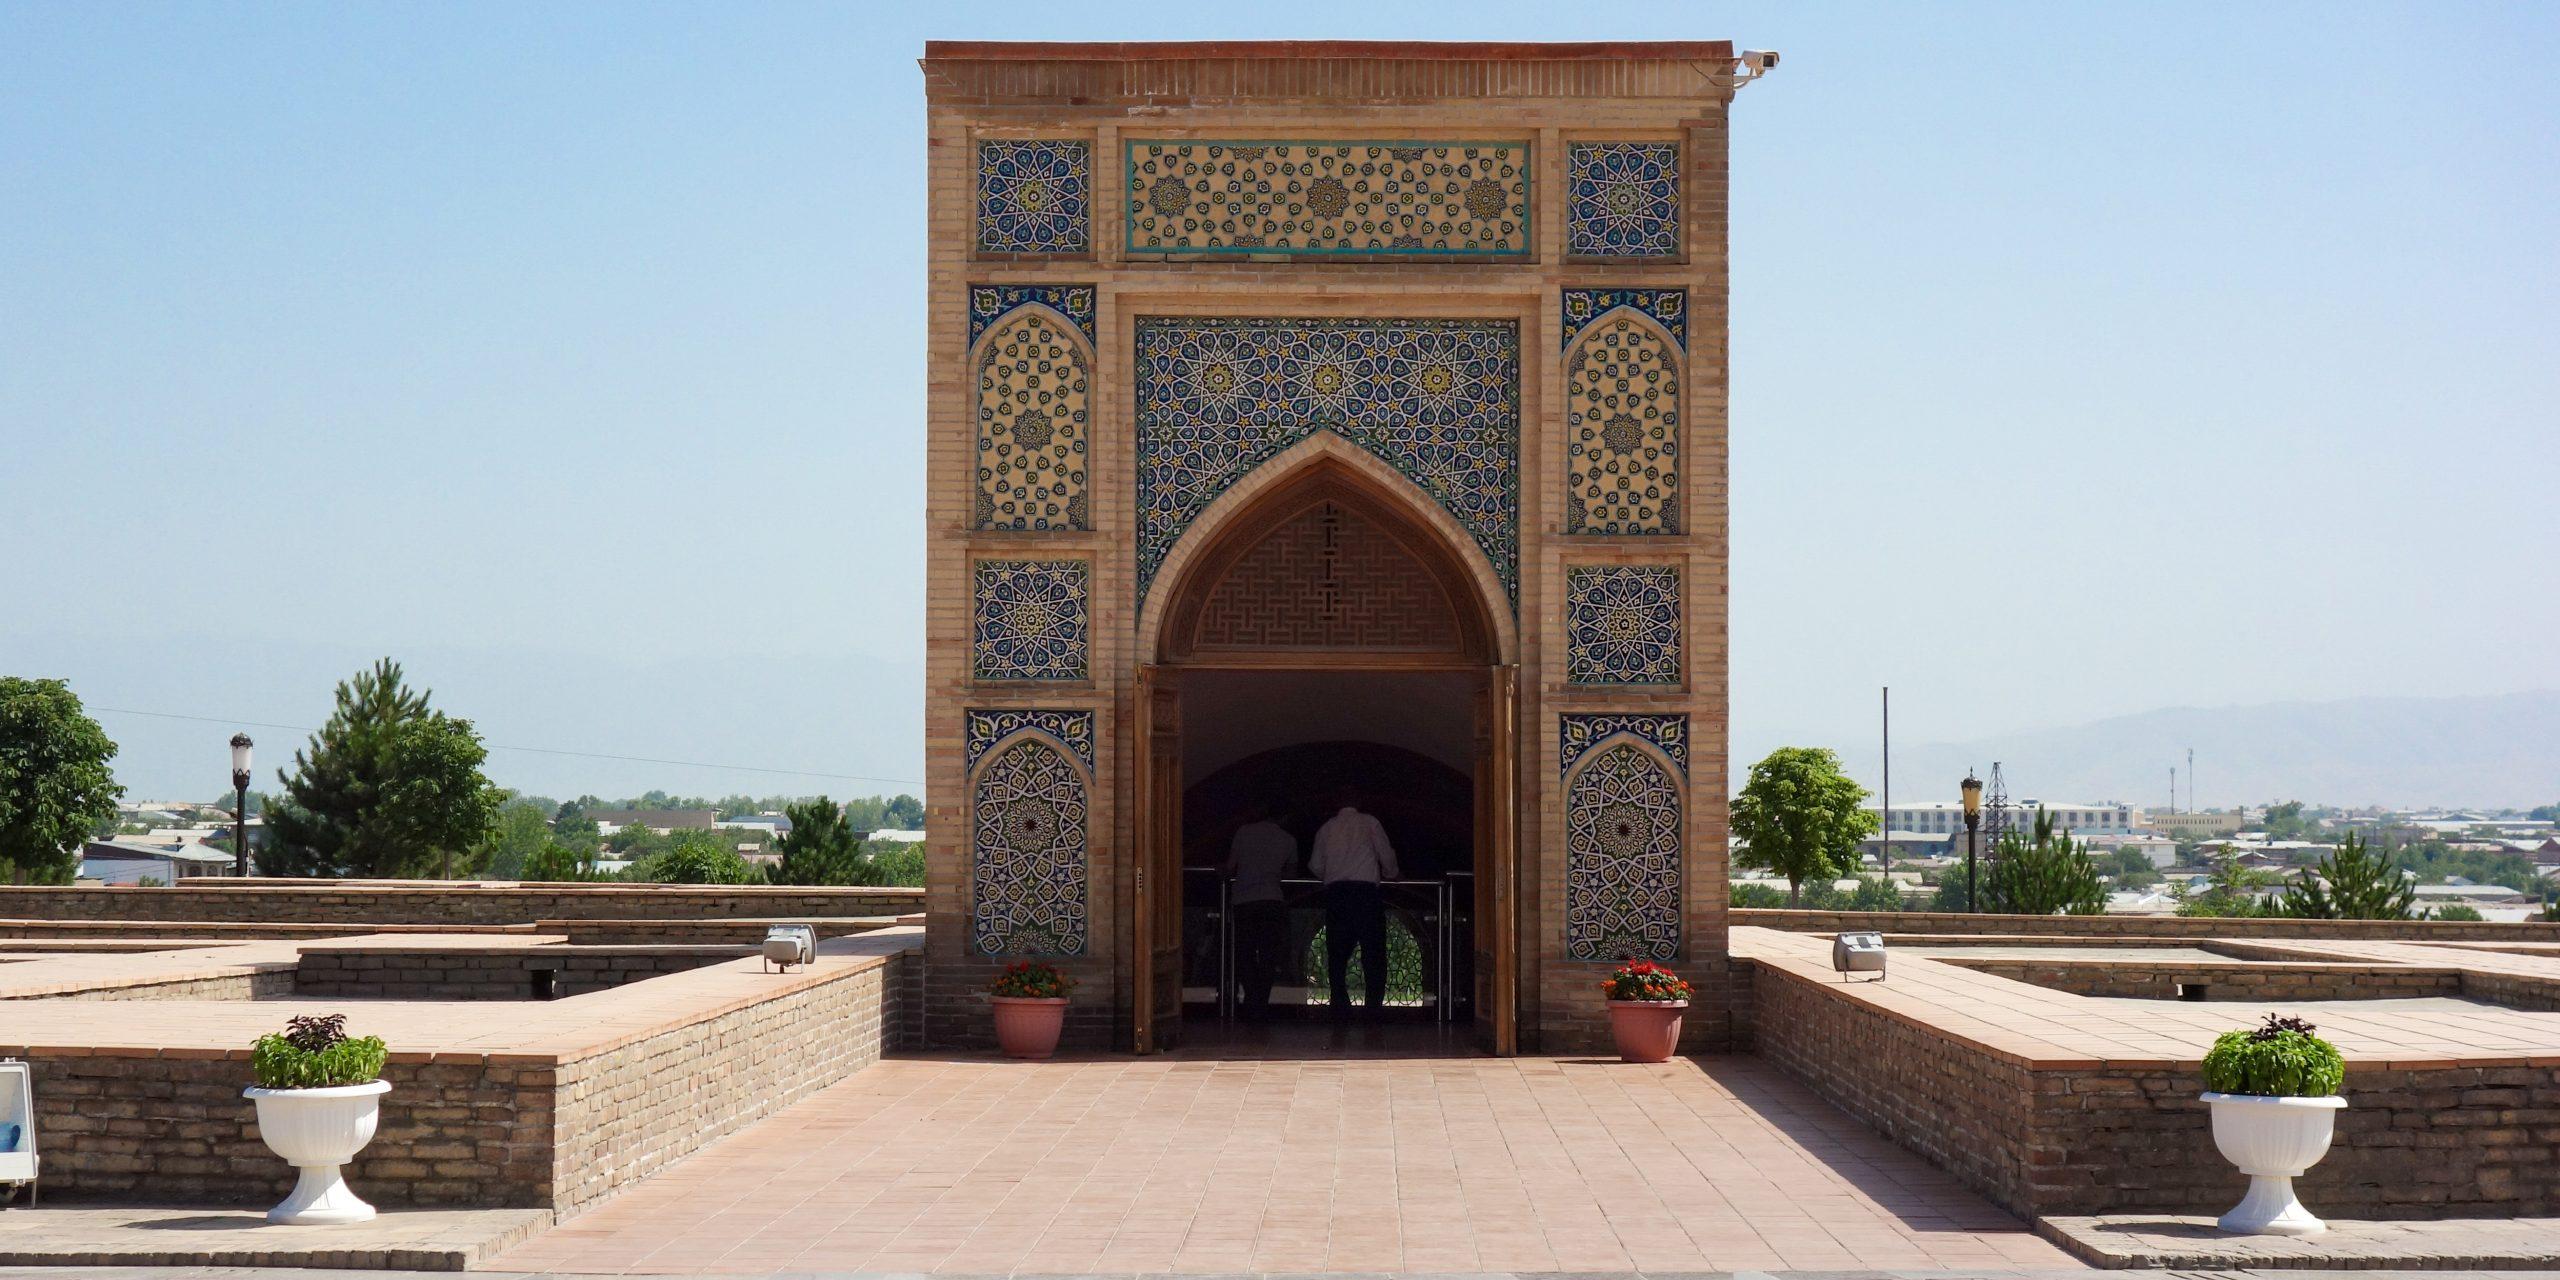 Ulugbek's Observatory in Samarkand, Uzbekistan